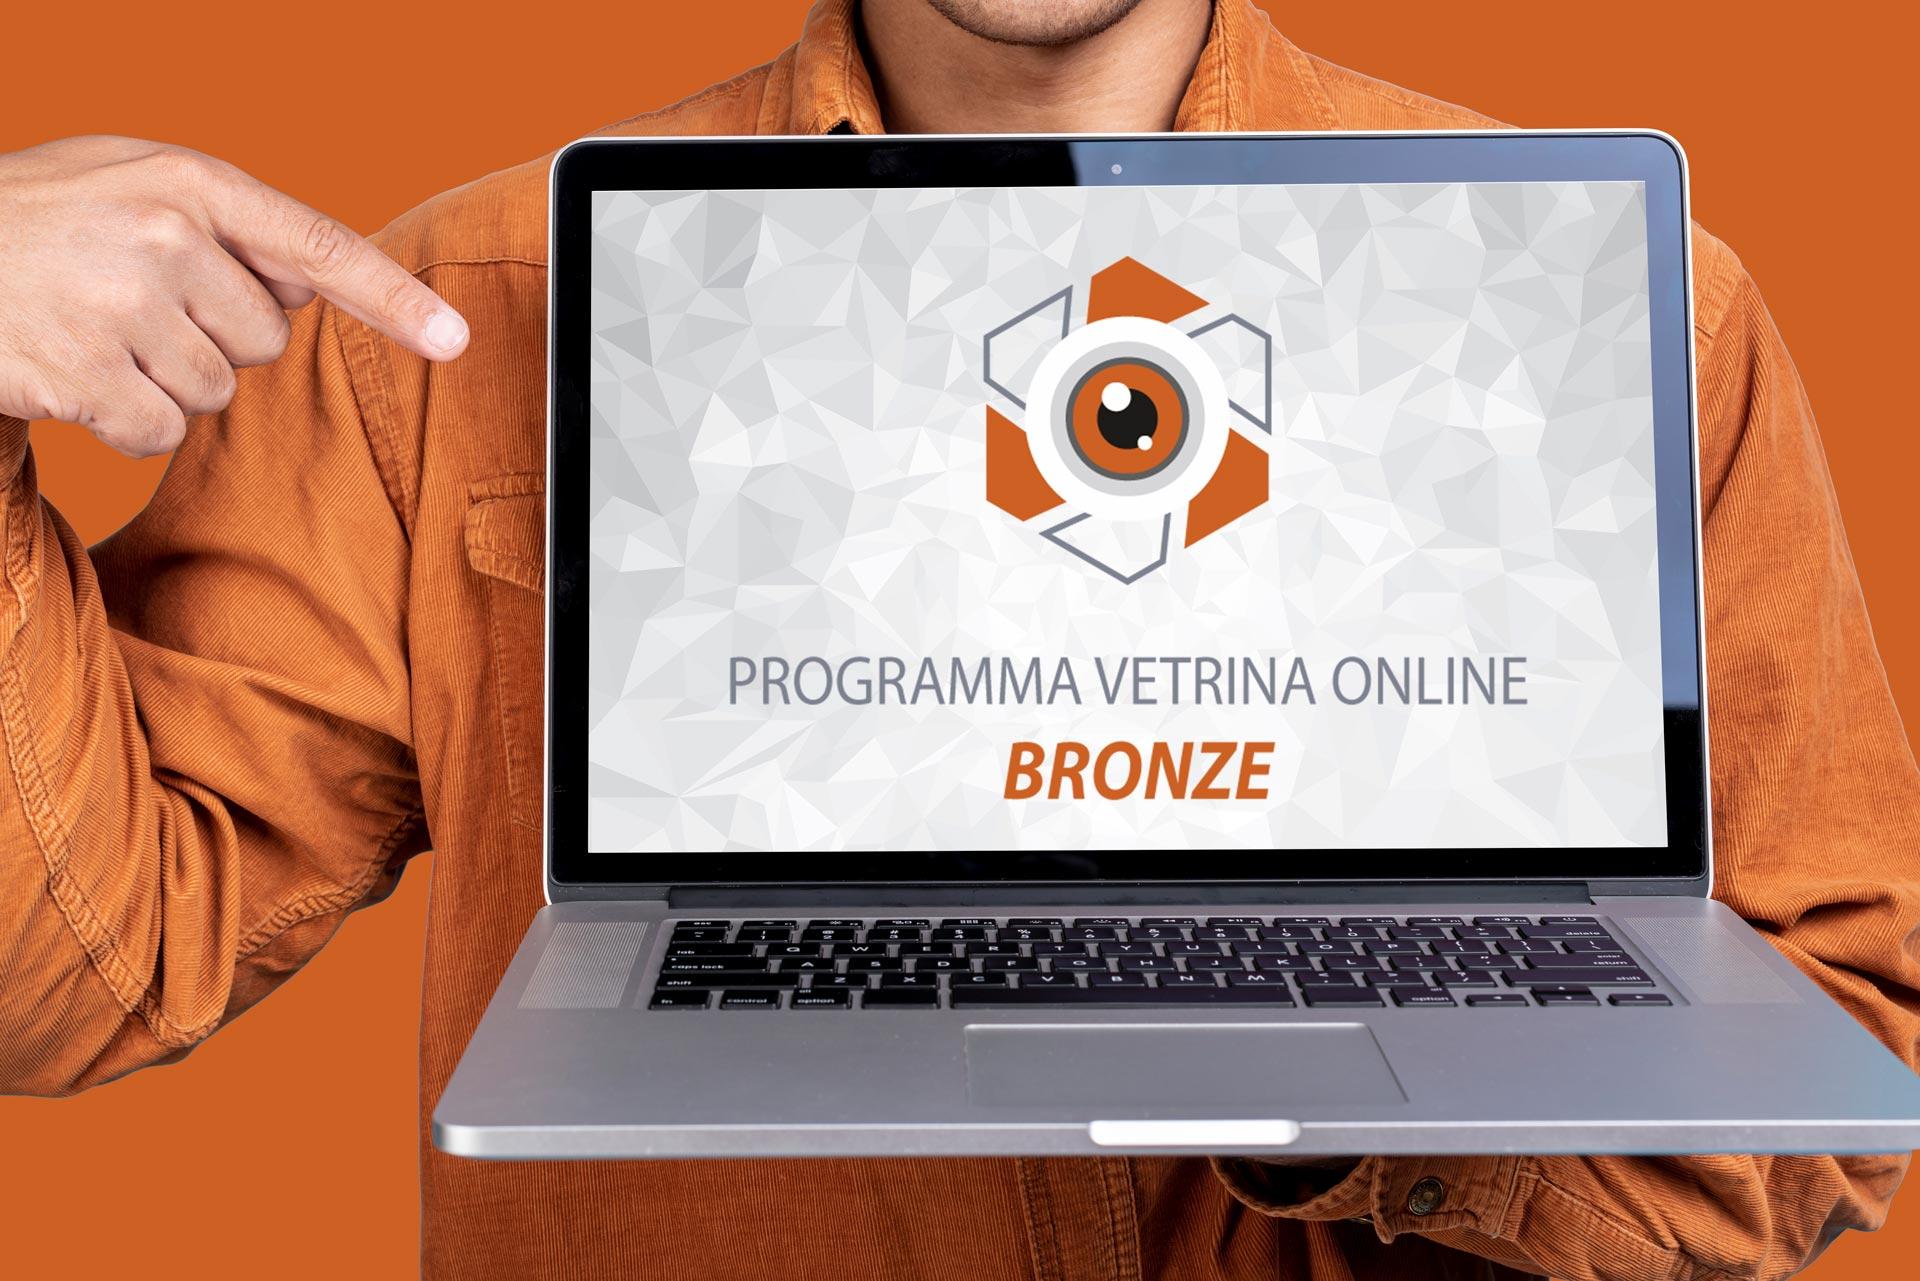 Programma-Vetrina--Online-BRONZE